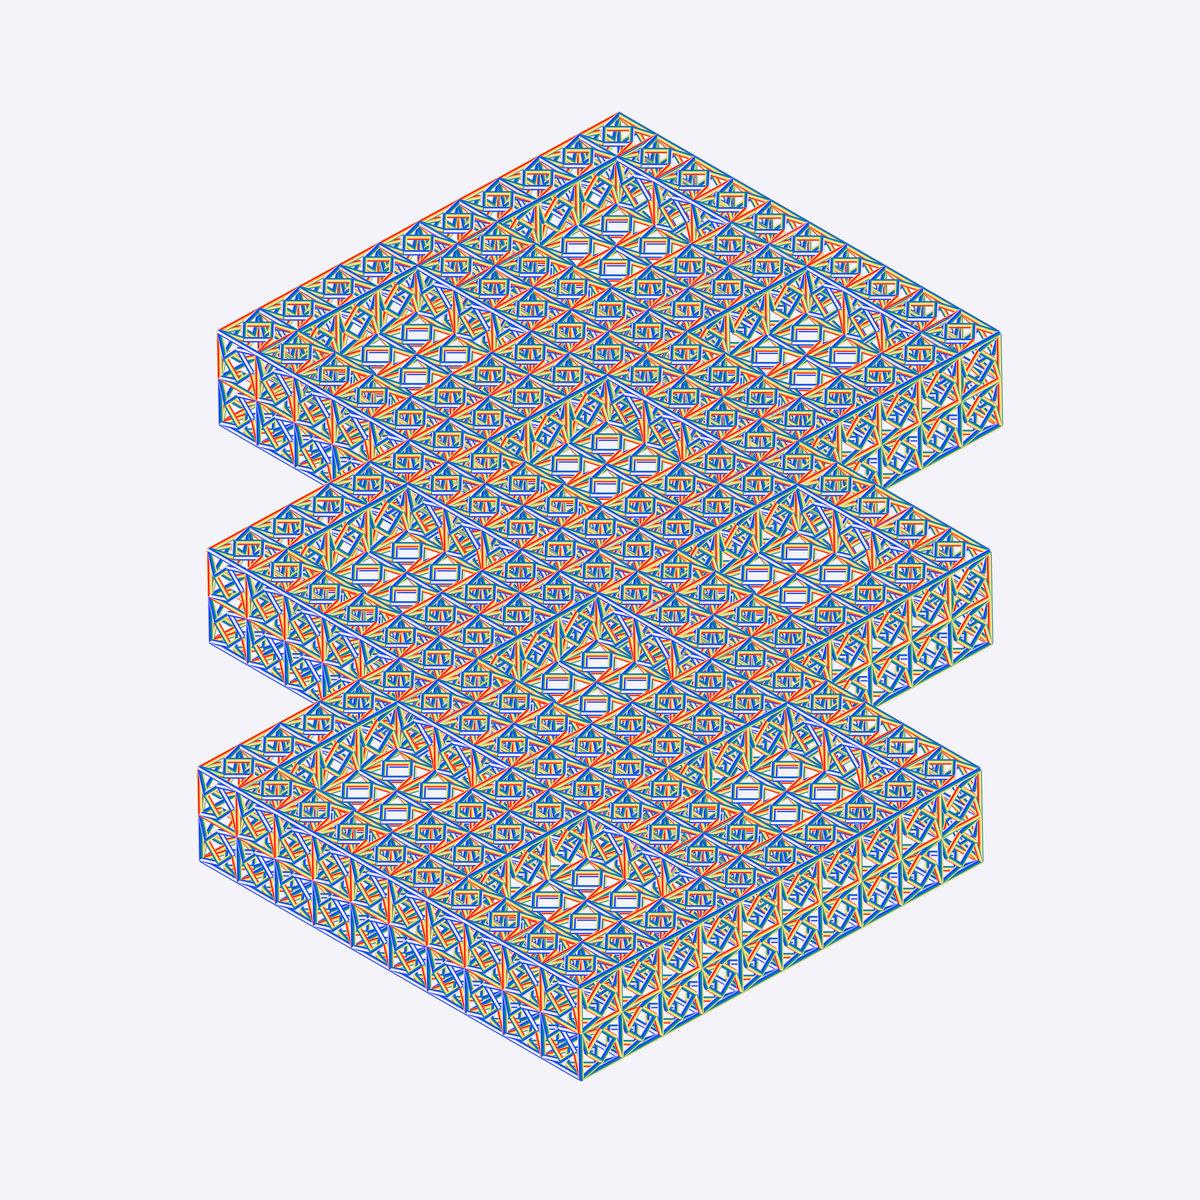 VISIBLE CLOAKS - REASSEMBLAGE (RVNG INTL., 2017)